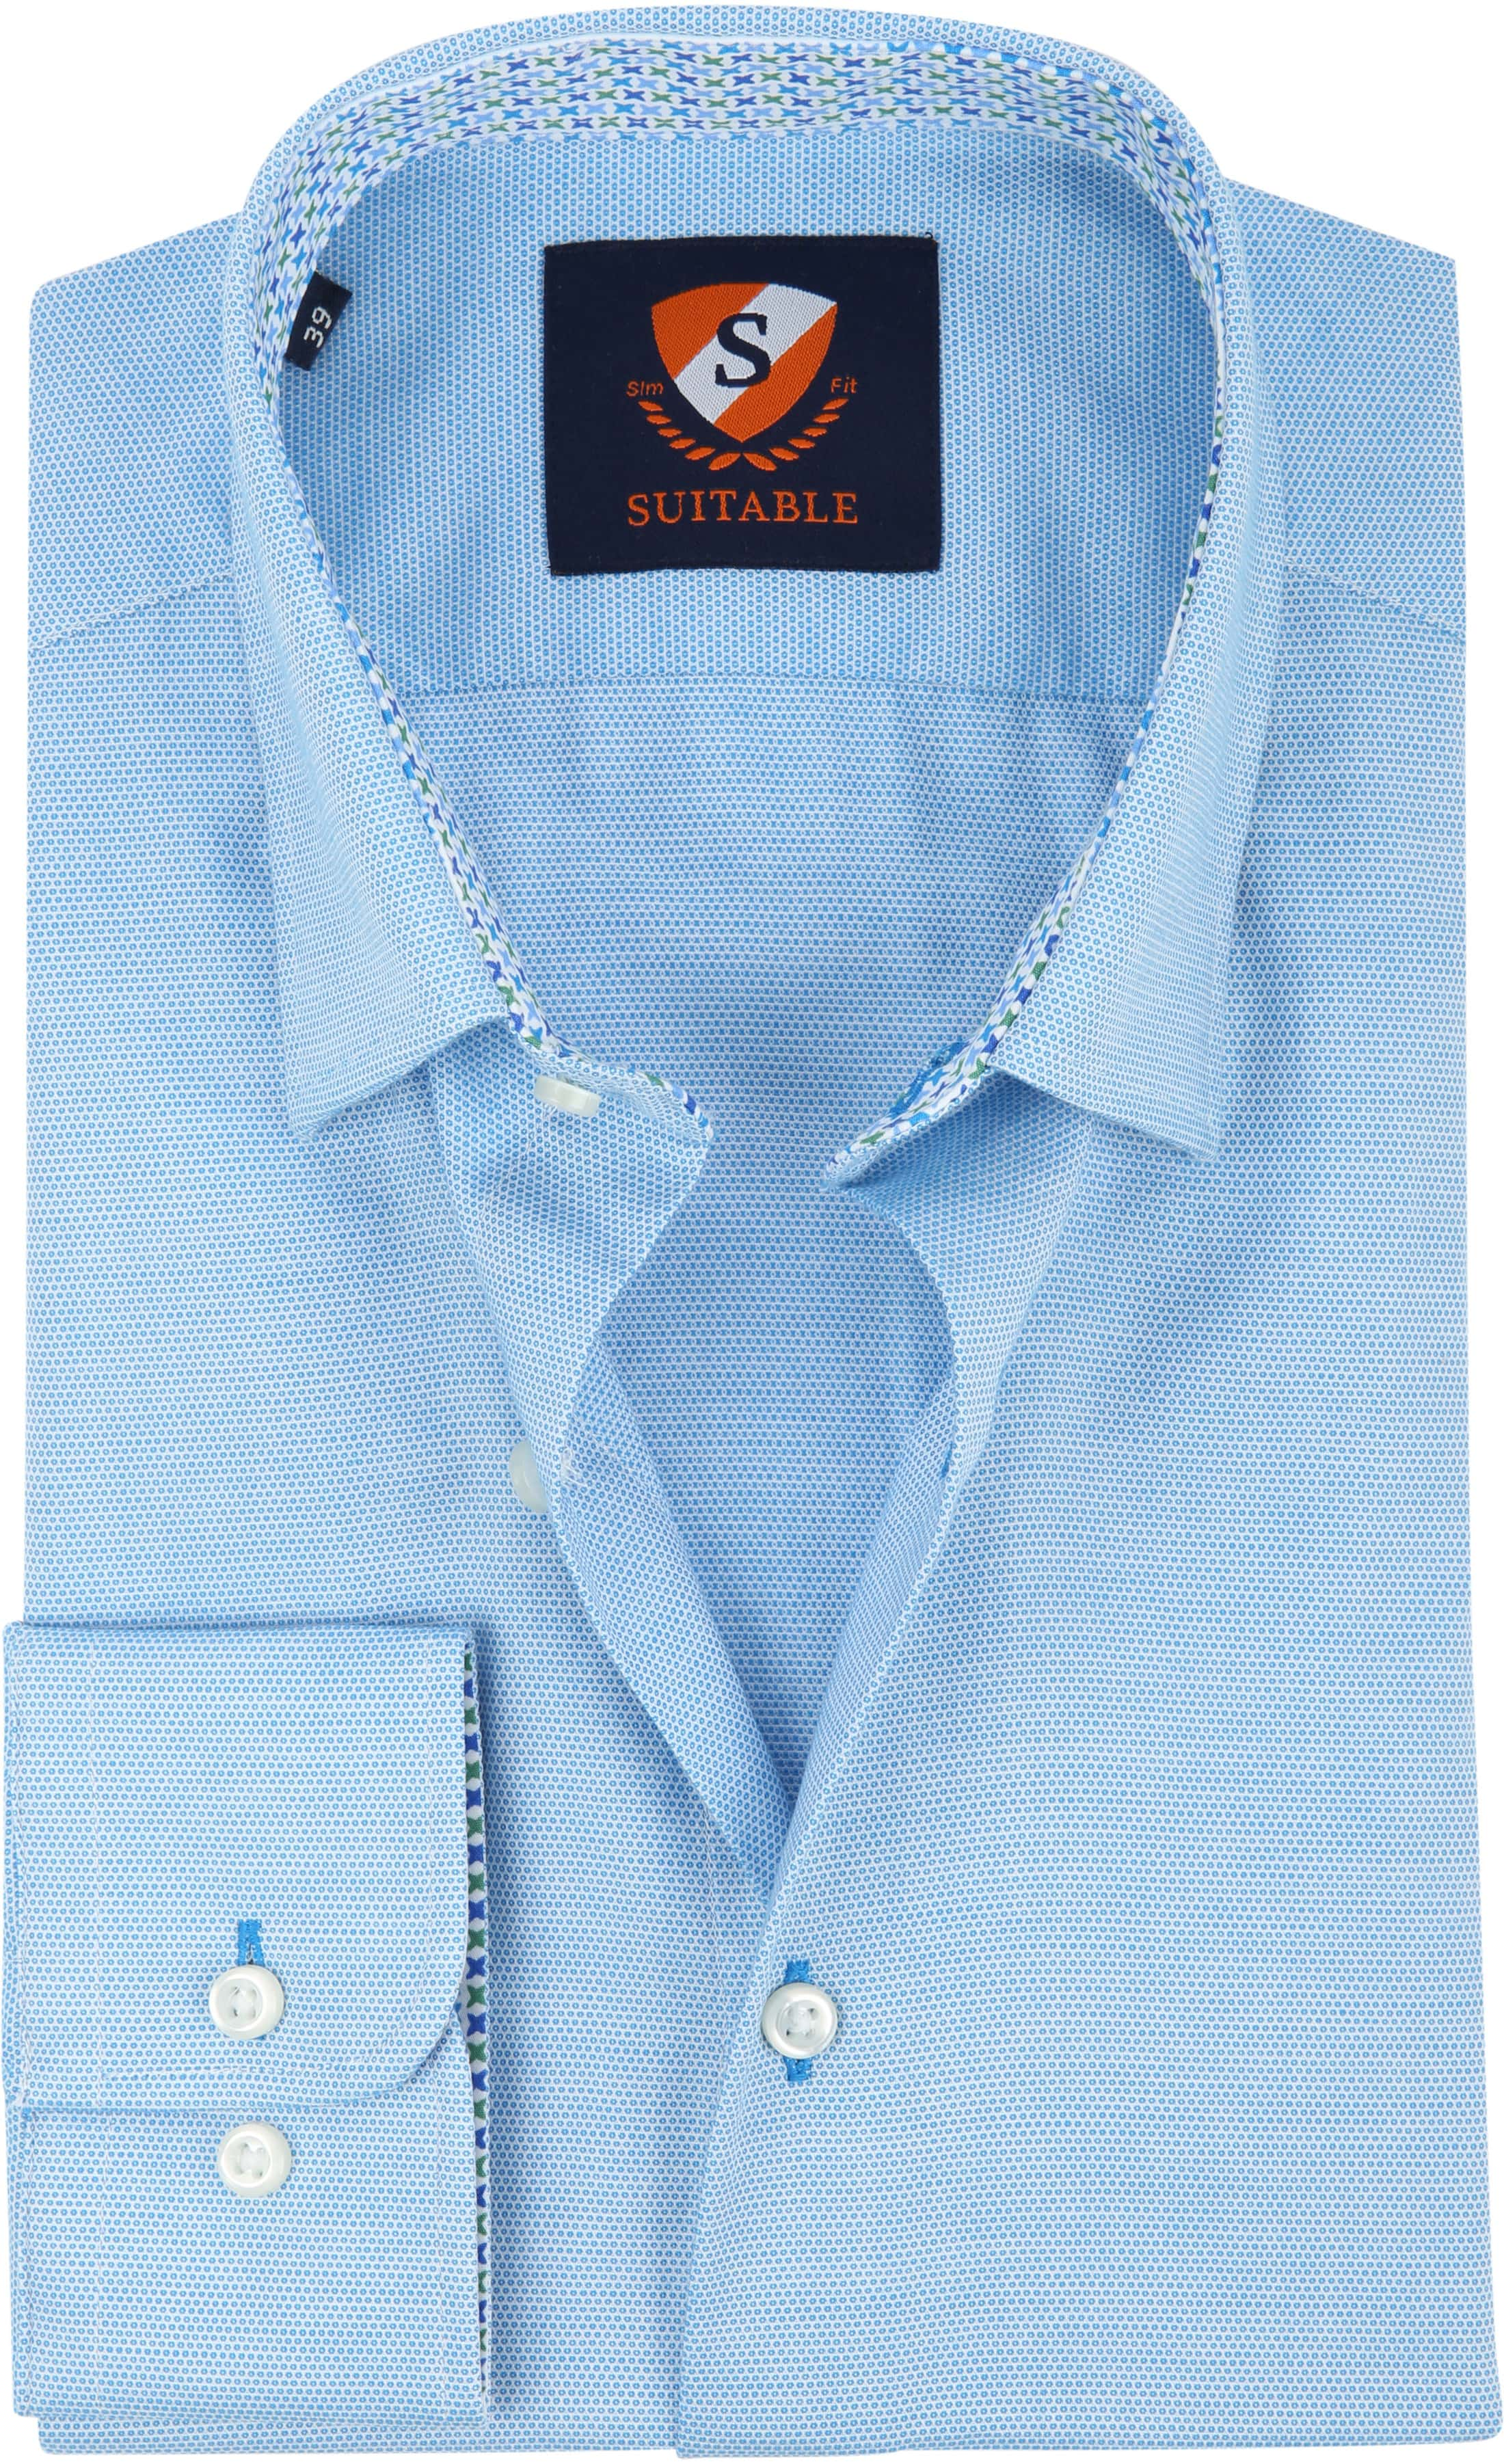 Suitable Overhemd HBD Wesley Lichtblauw foto 0